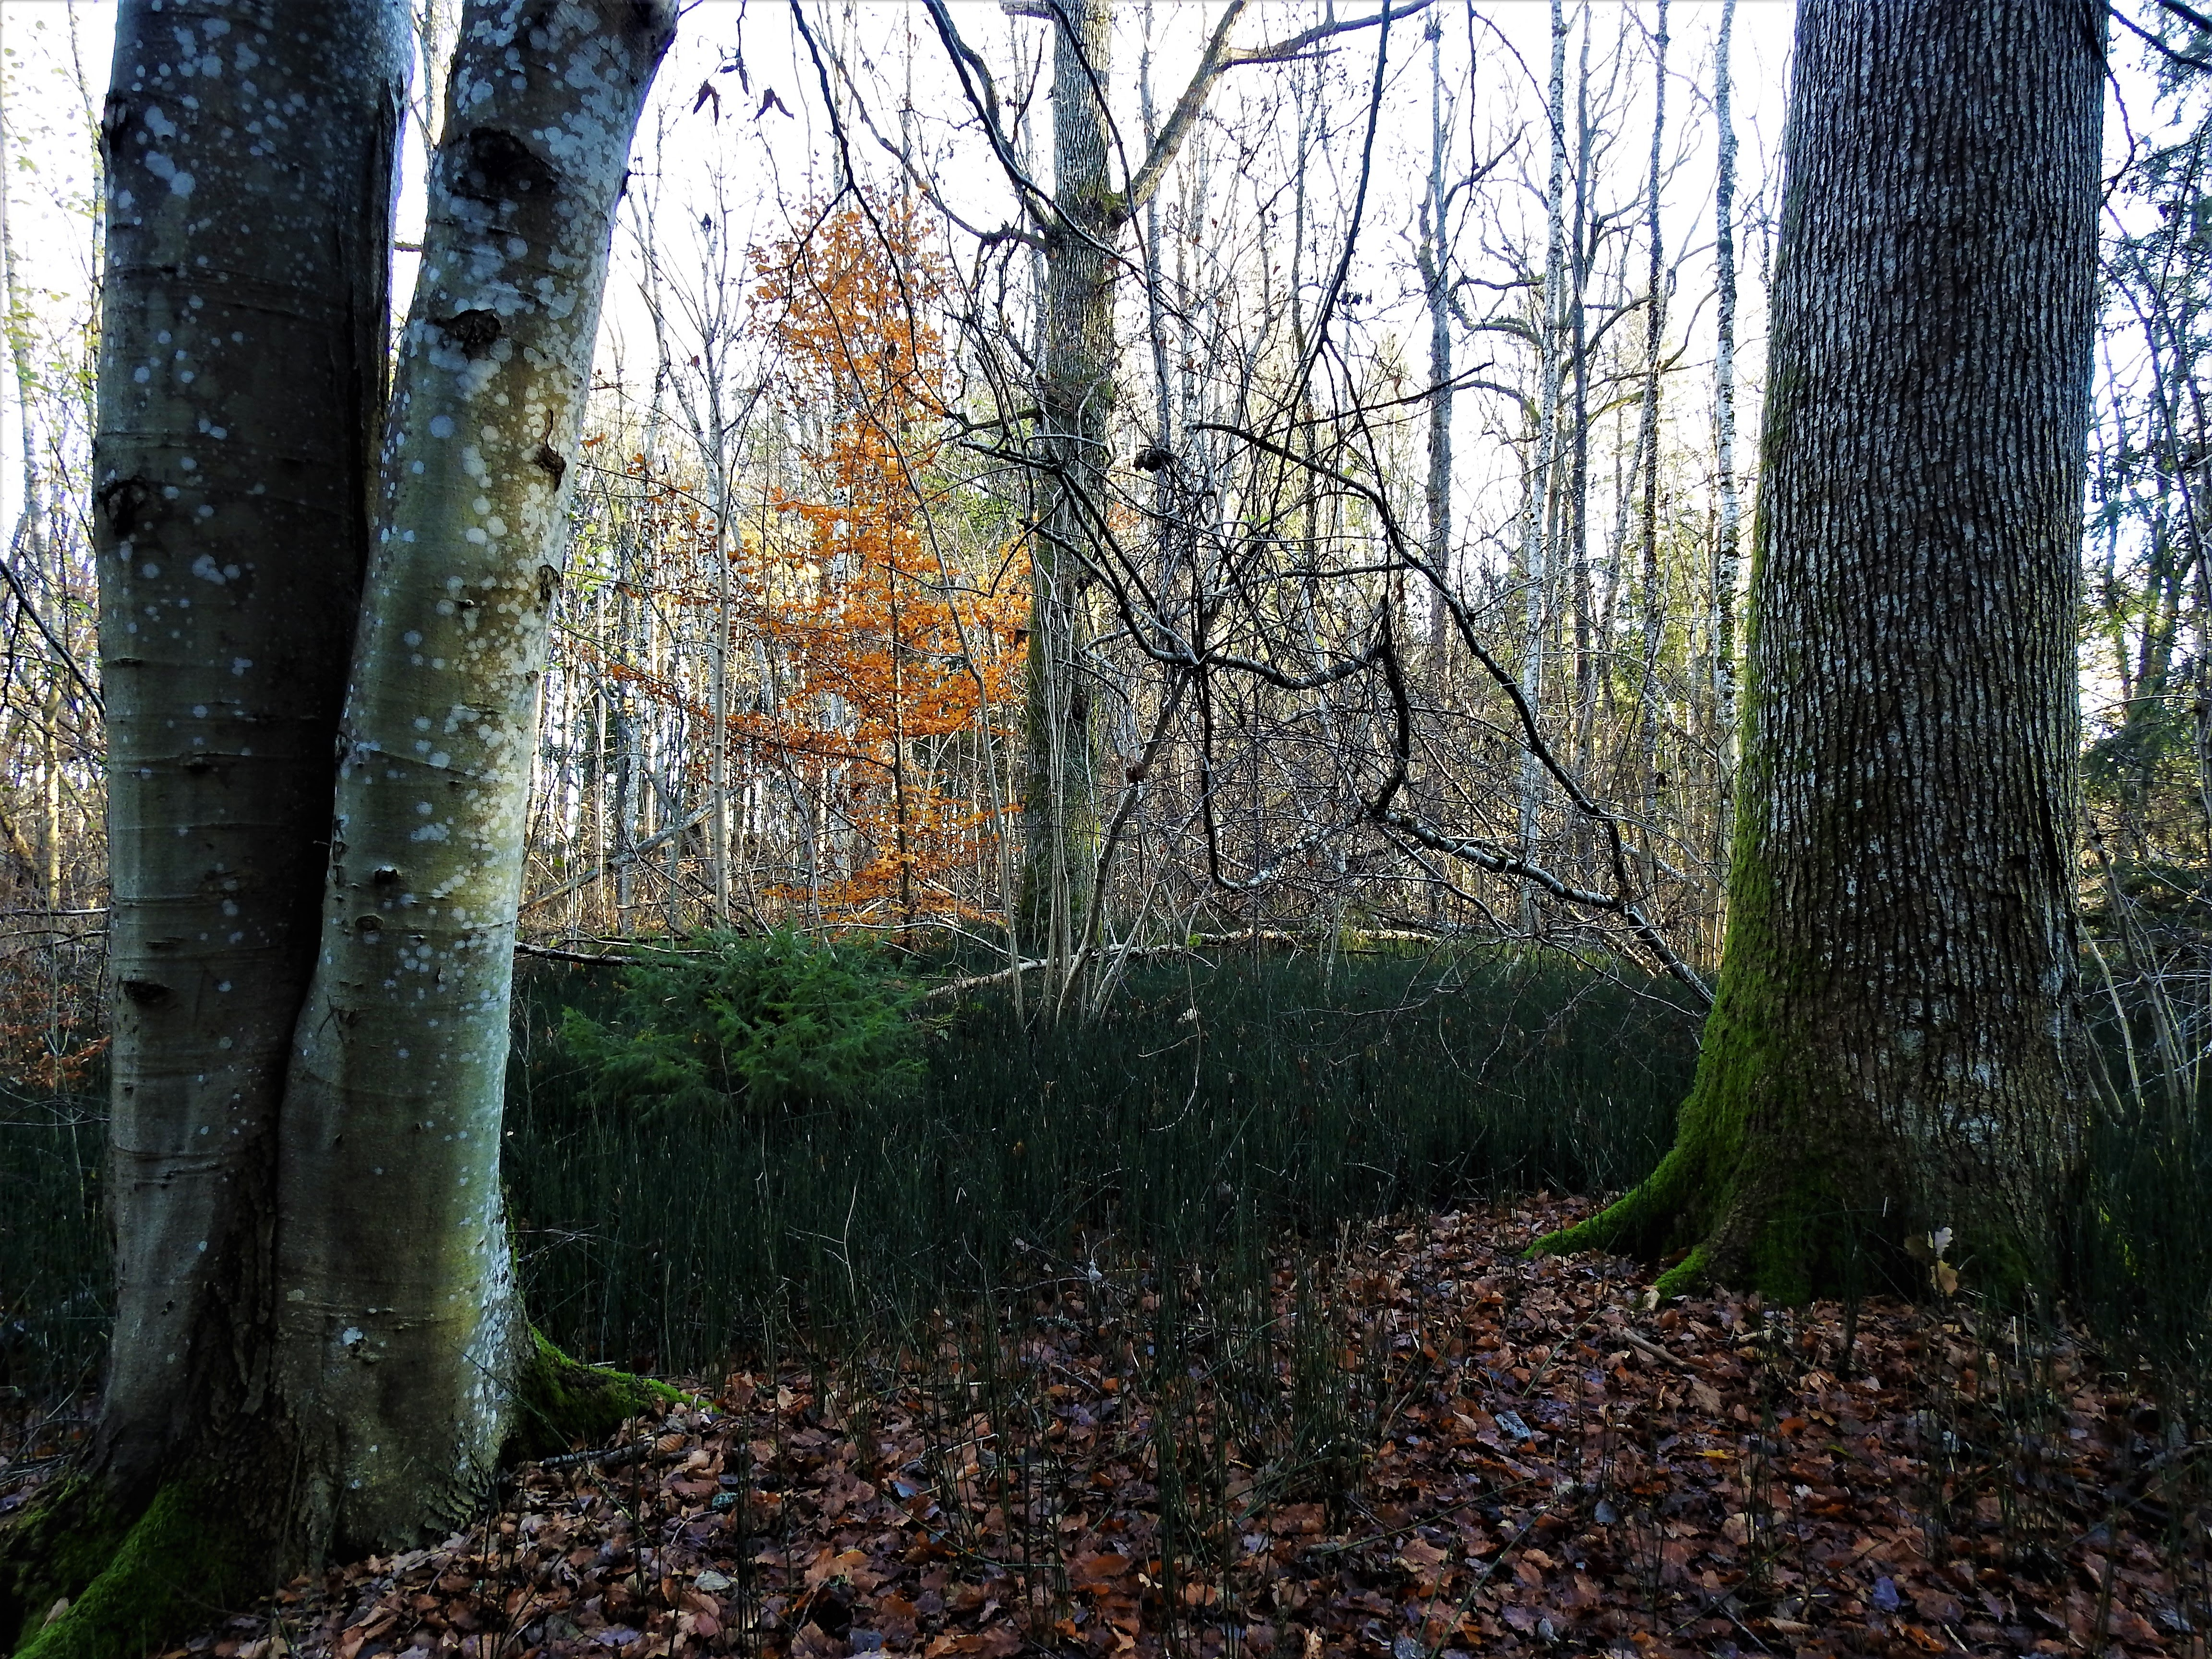 Hekte damp innsjø skog